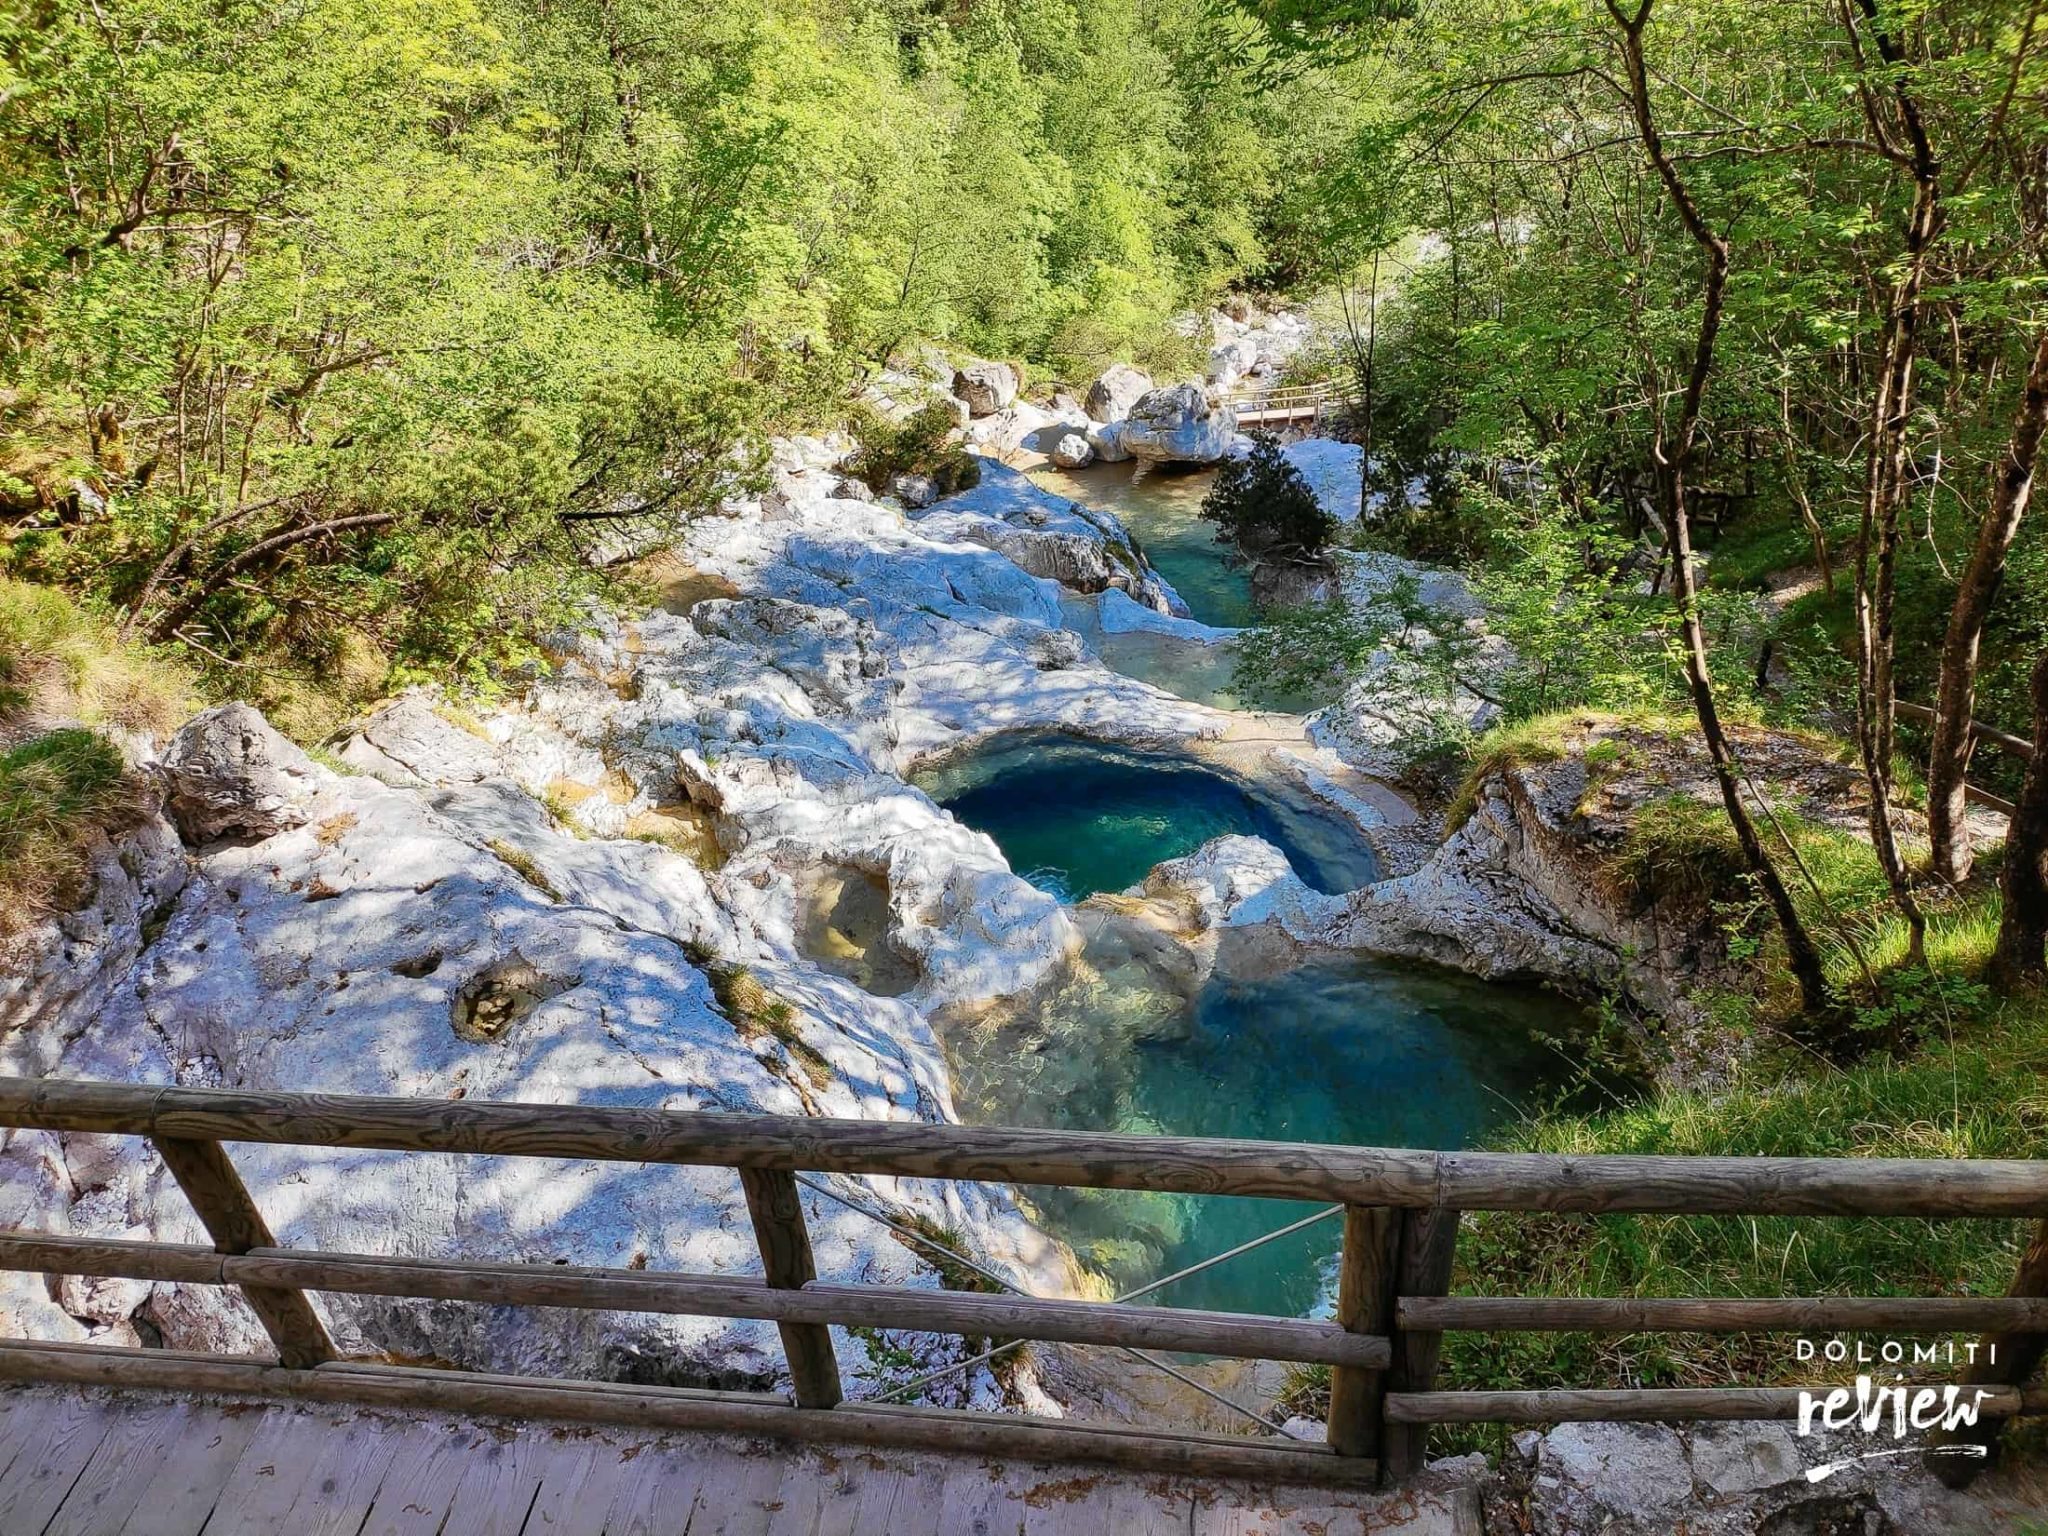 Cadini del Brenton - Valle del Mis - foto Dolomiti Review